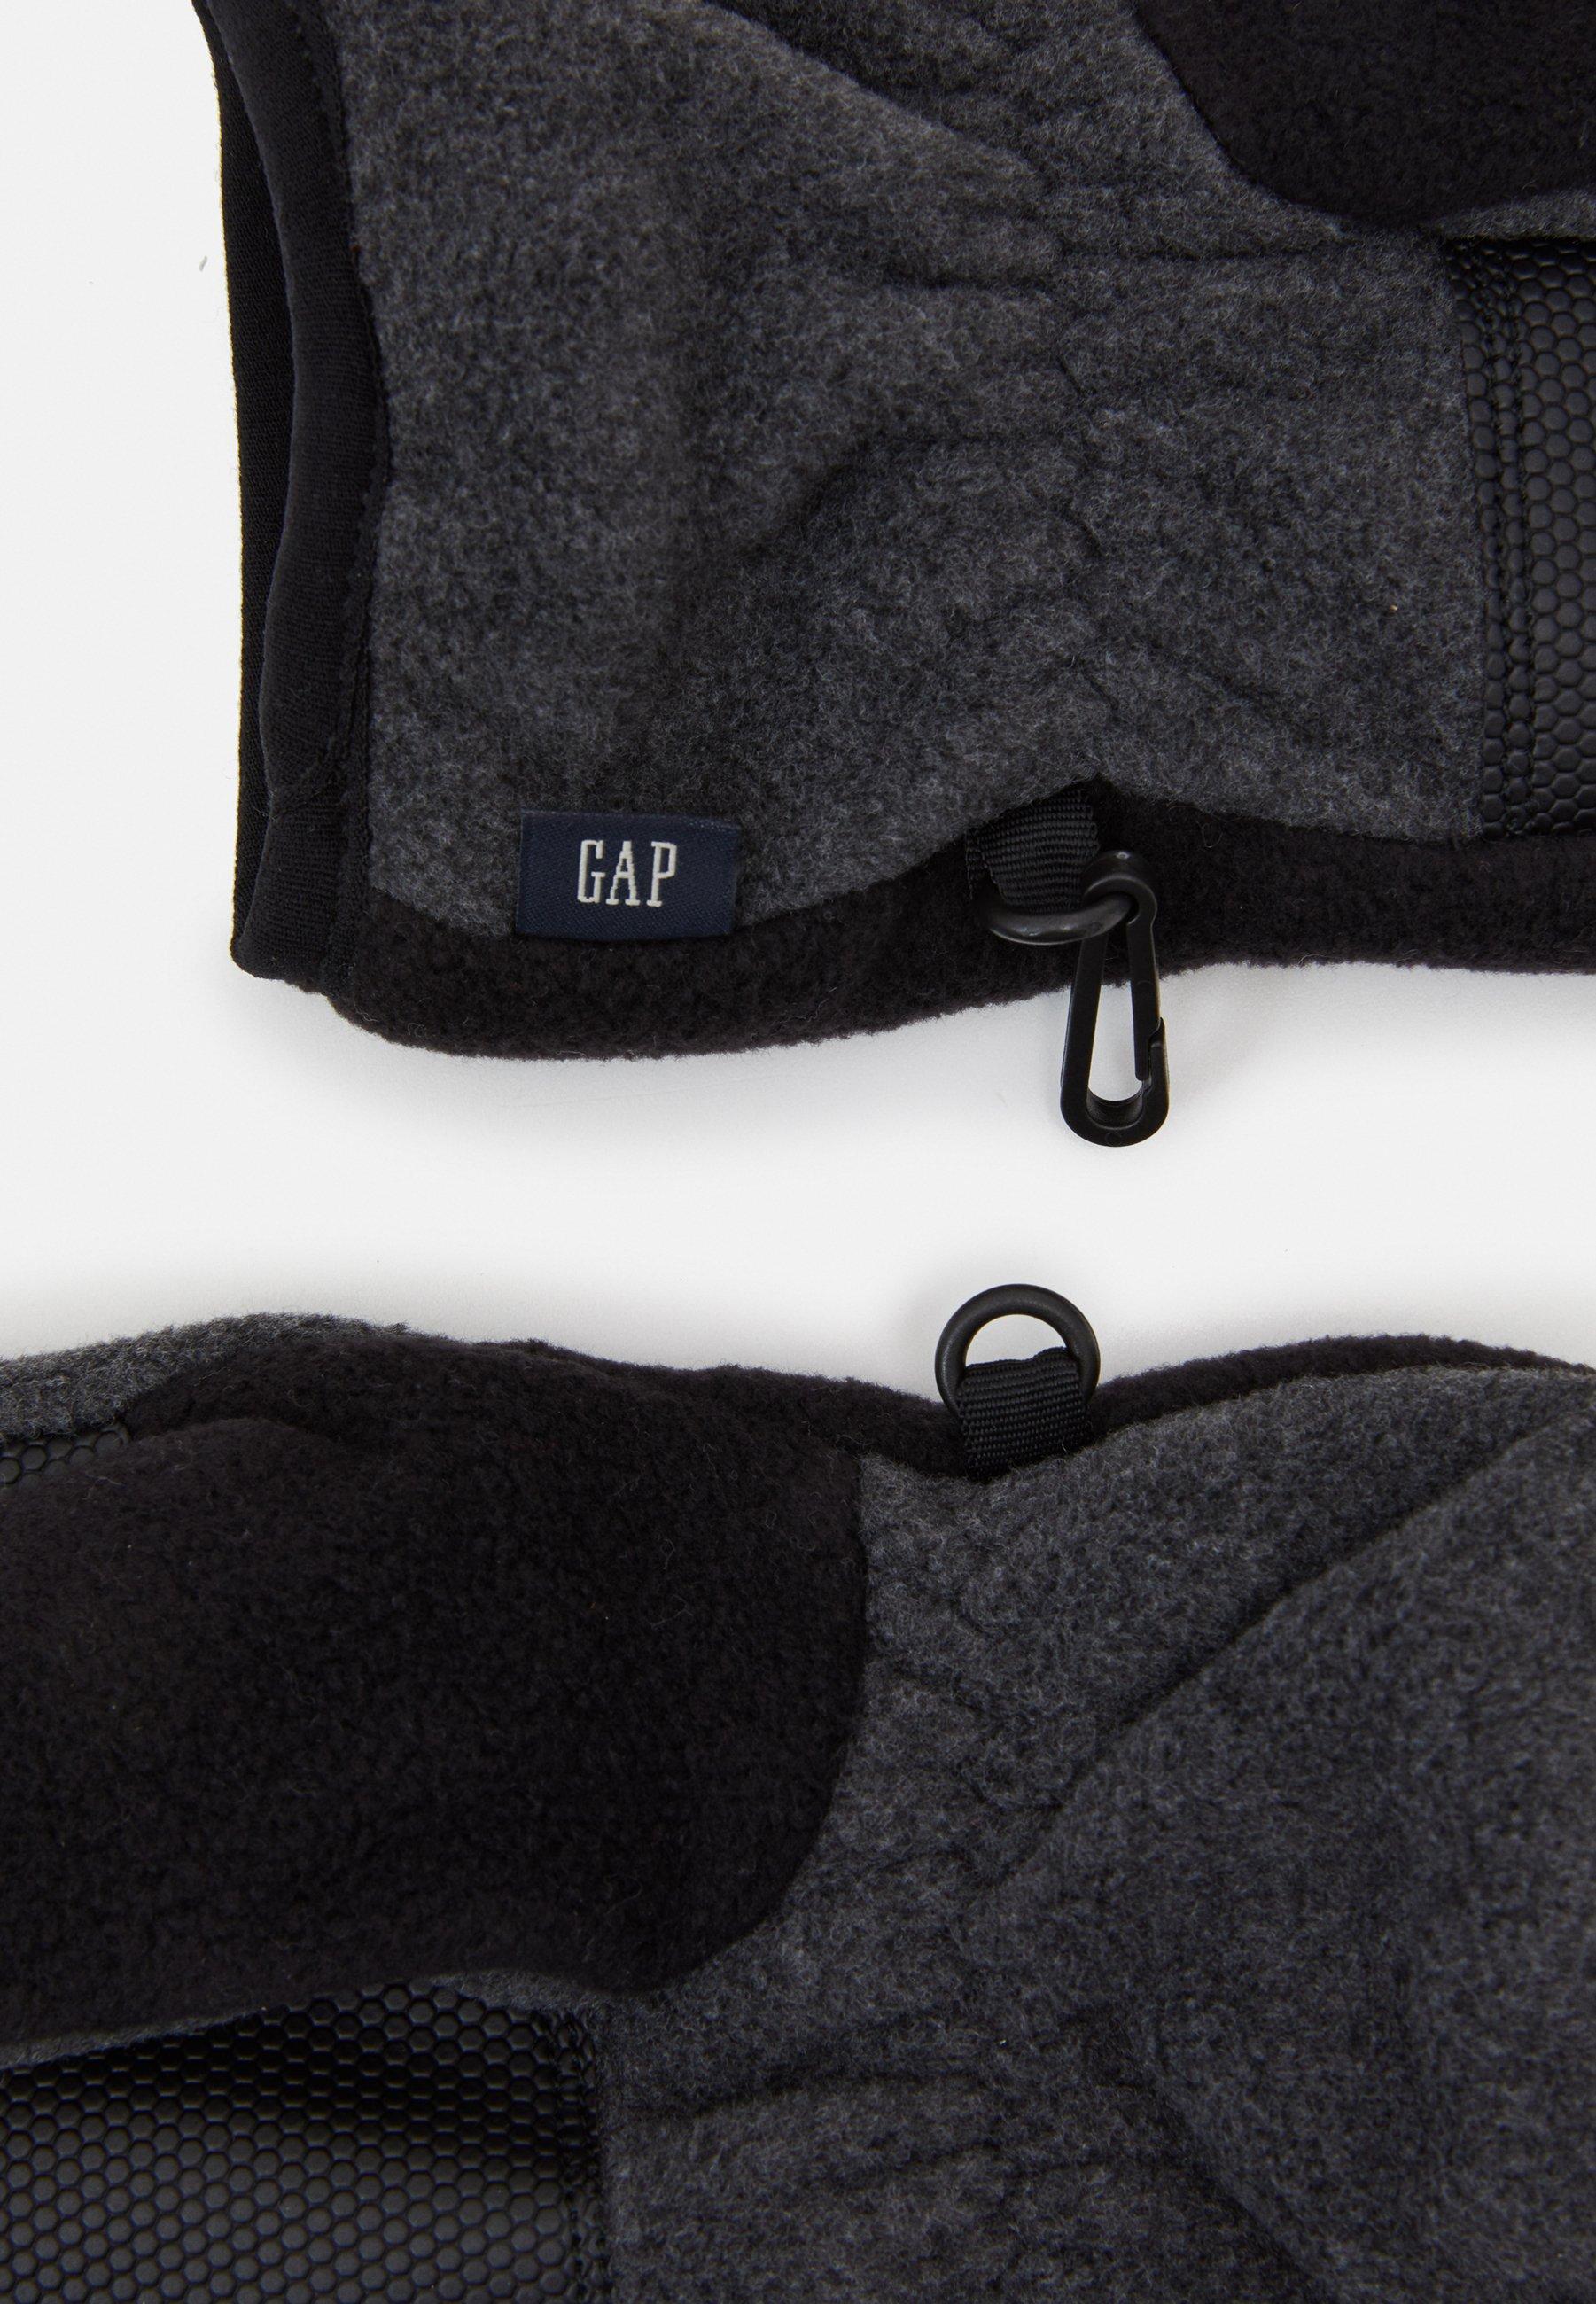 GAP GLOVE - Hansker - true black/svart q5BCDddUYt0xthV